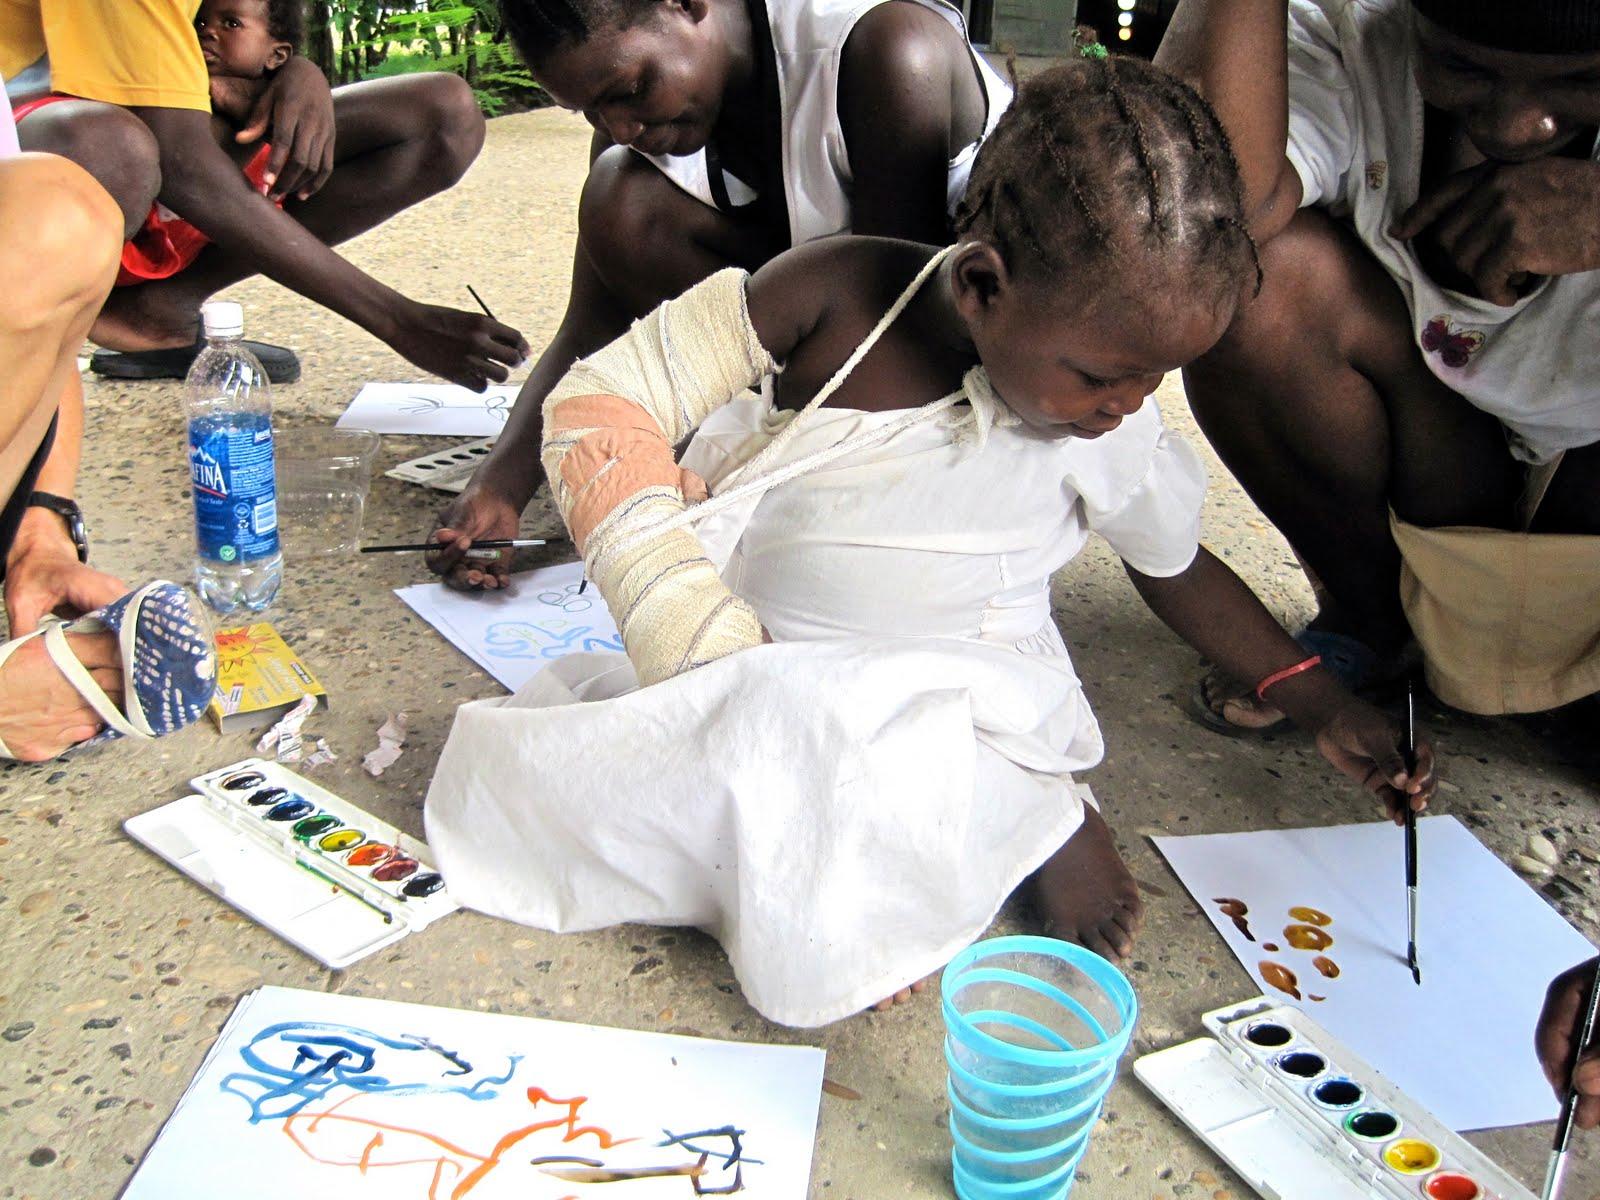 Hôpital Albert Schweitzer Haiti: High School Student's Visit